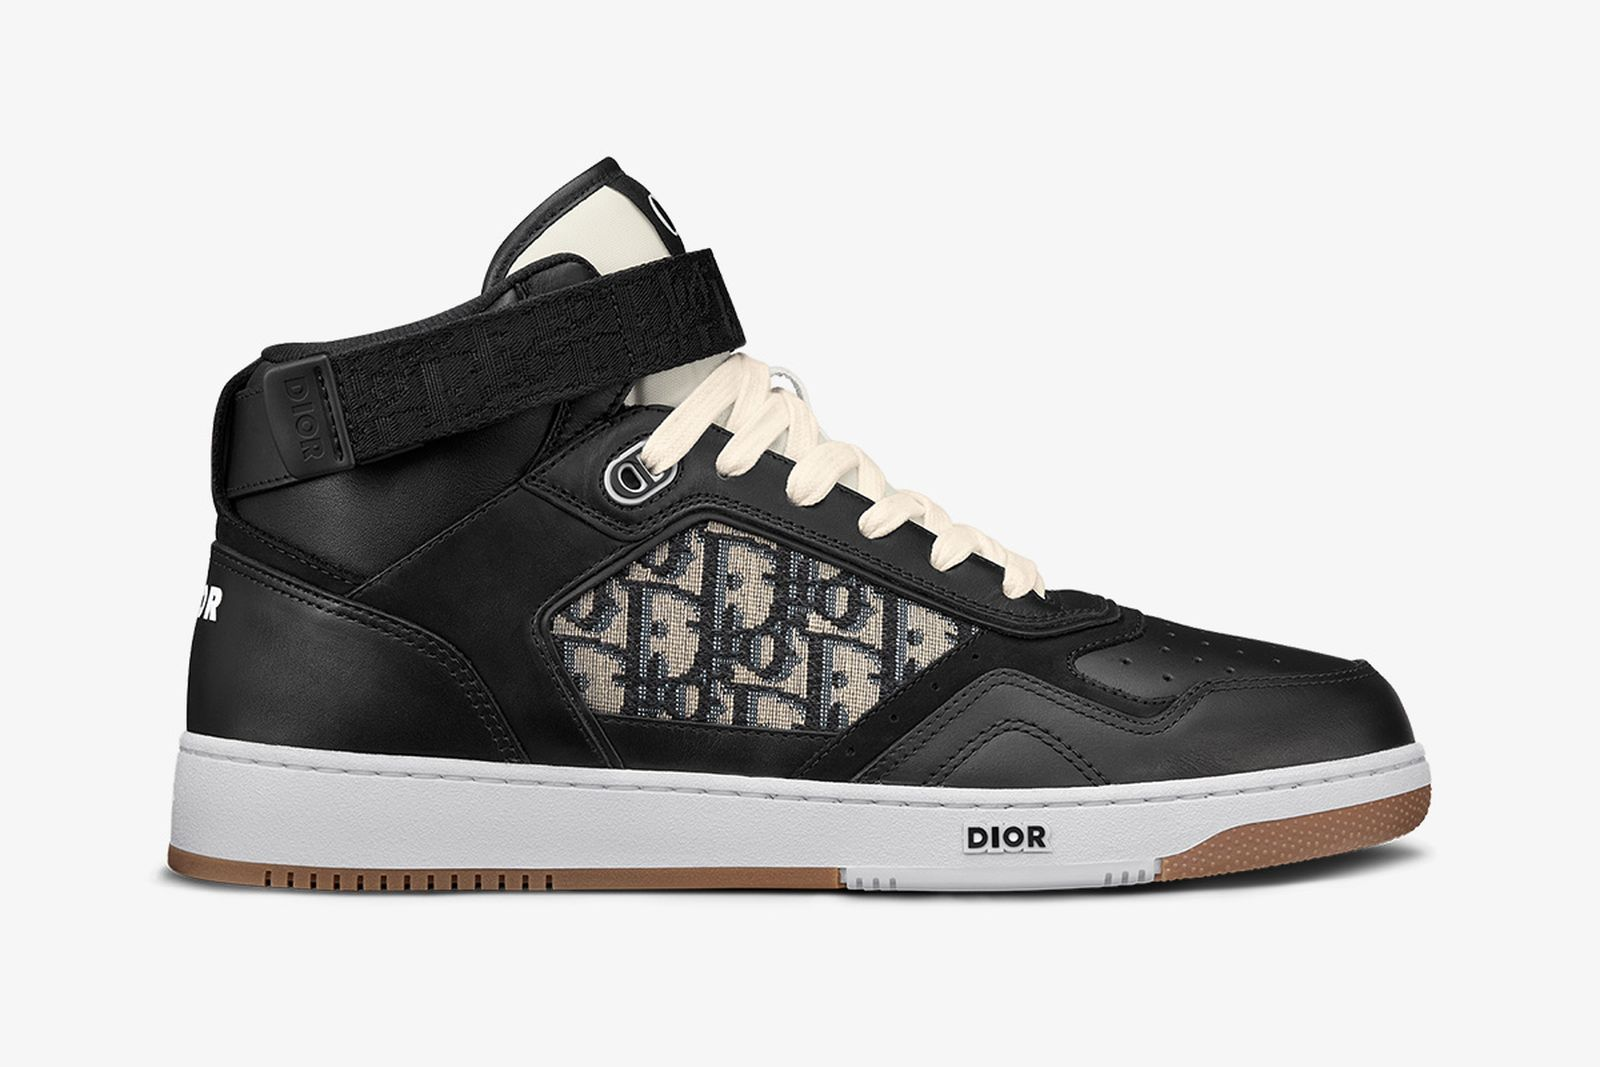 dior-b27-sneaker-release-date-price-01